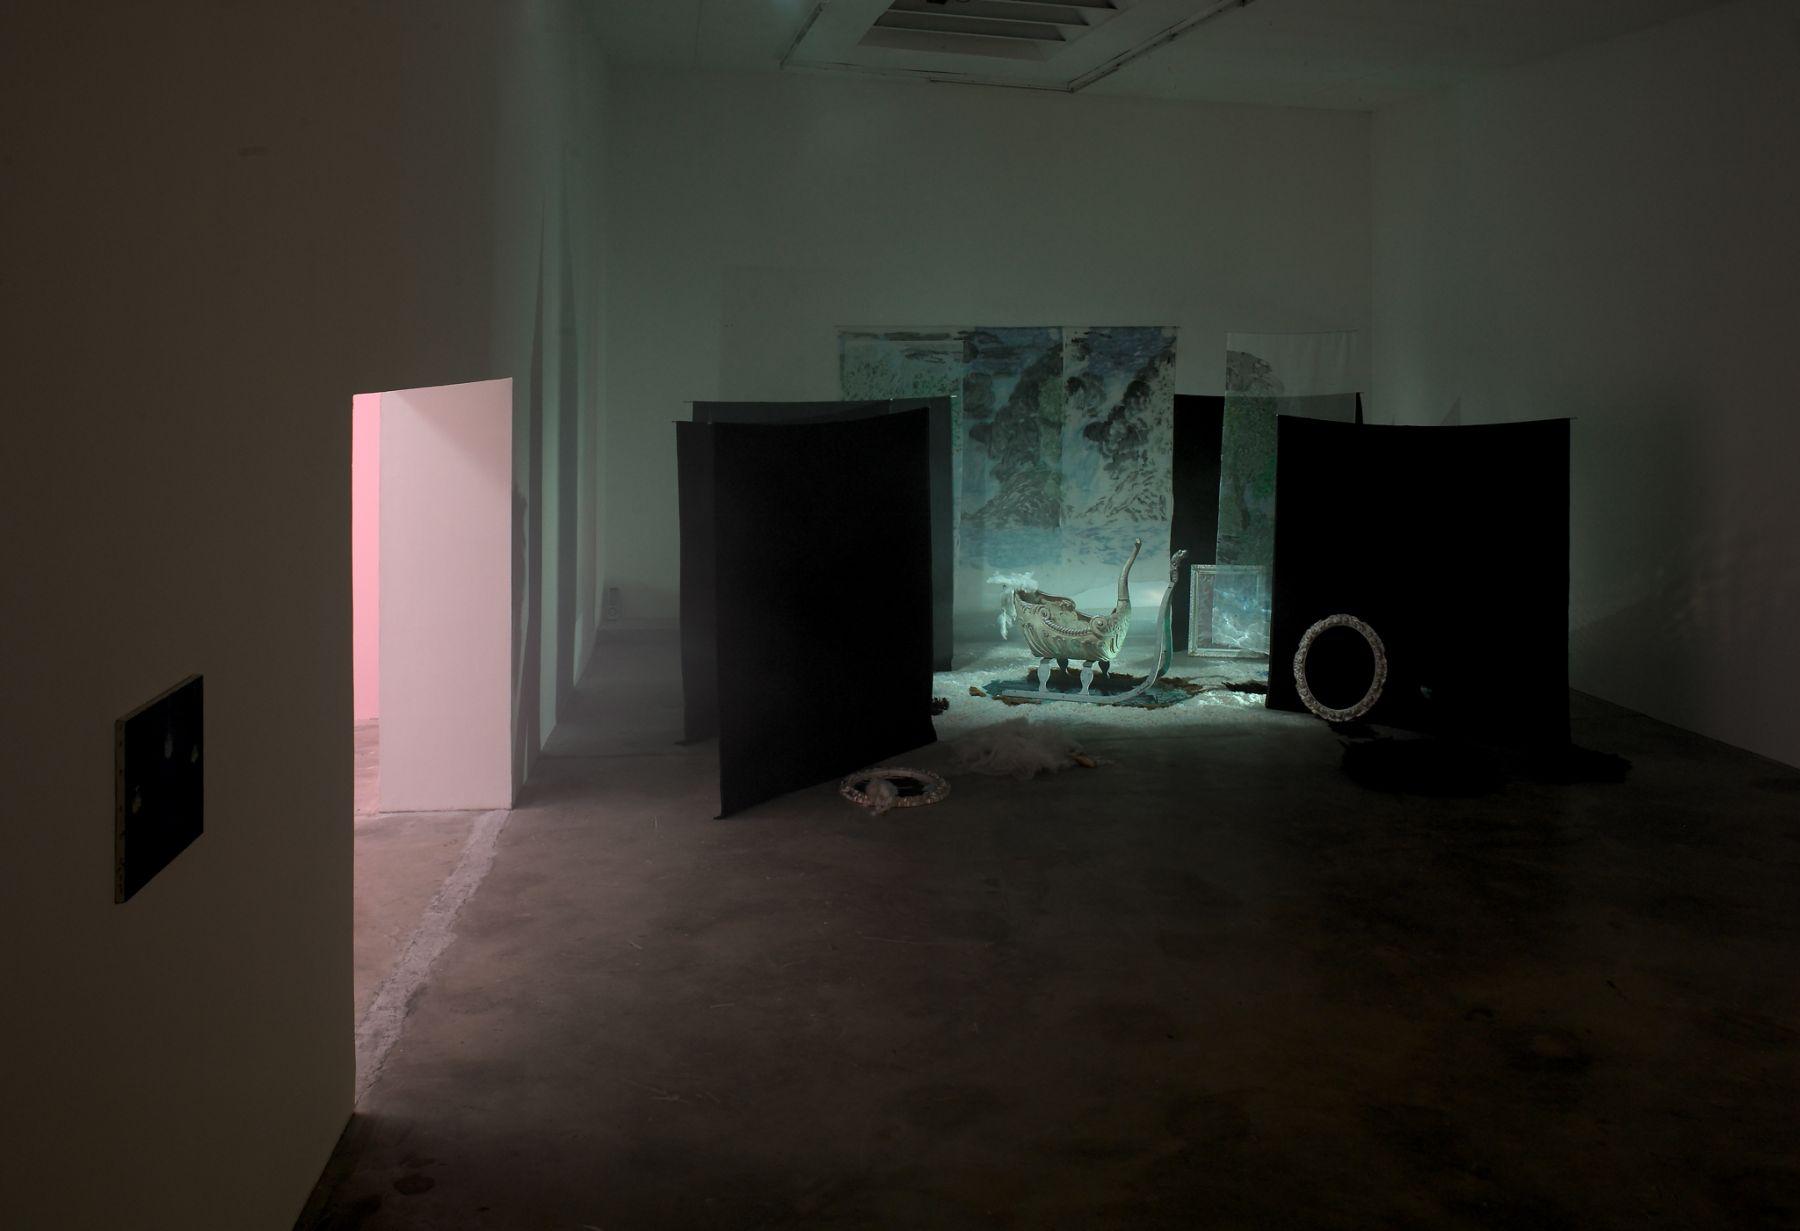 Karen Kilimnik, Le Consortium, Dijon, 2007